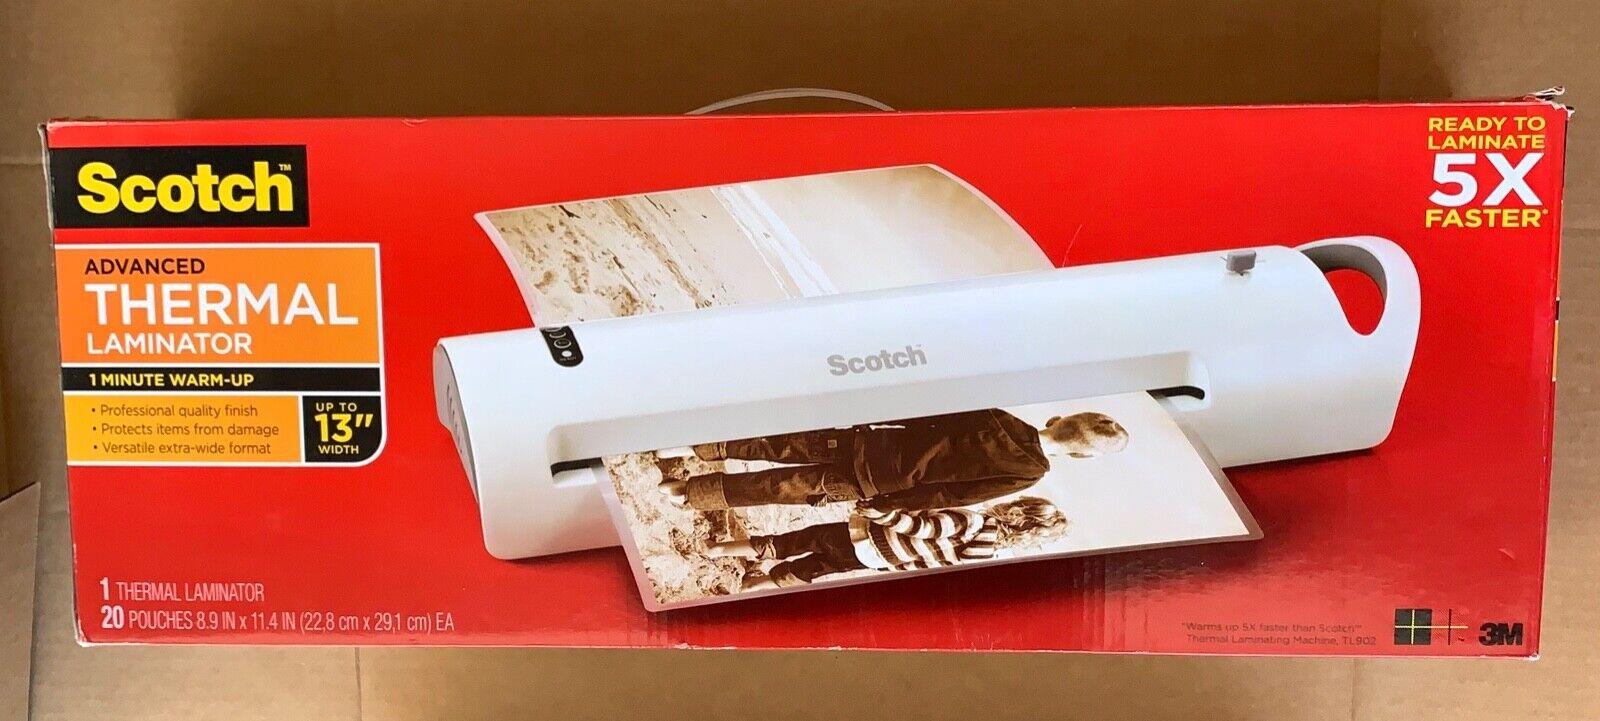 Scotch Advanced Thermal Laminator, Extra Wide 13-Inch Input,